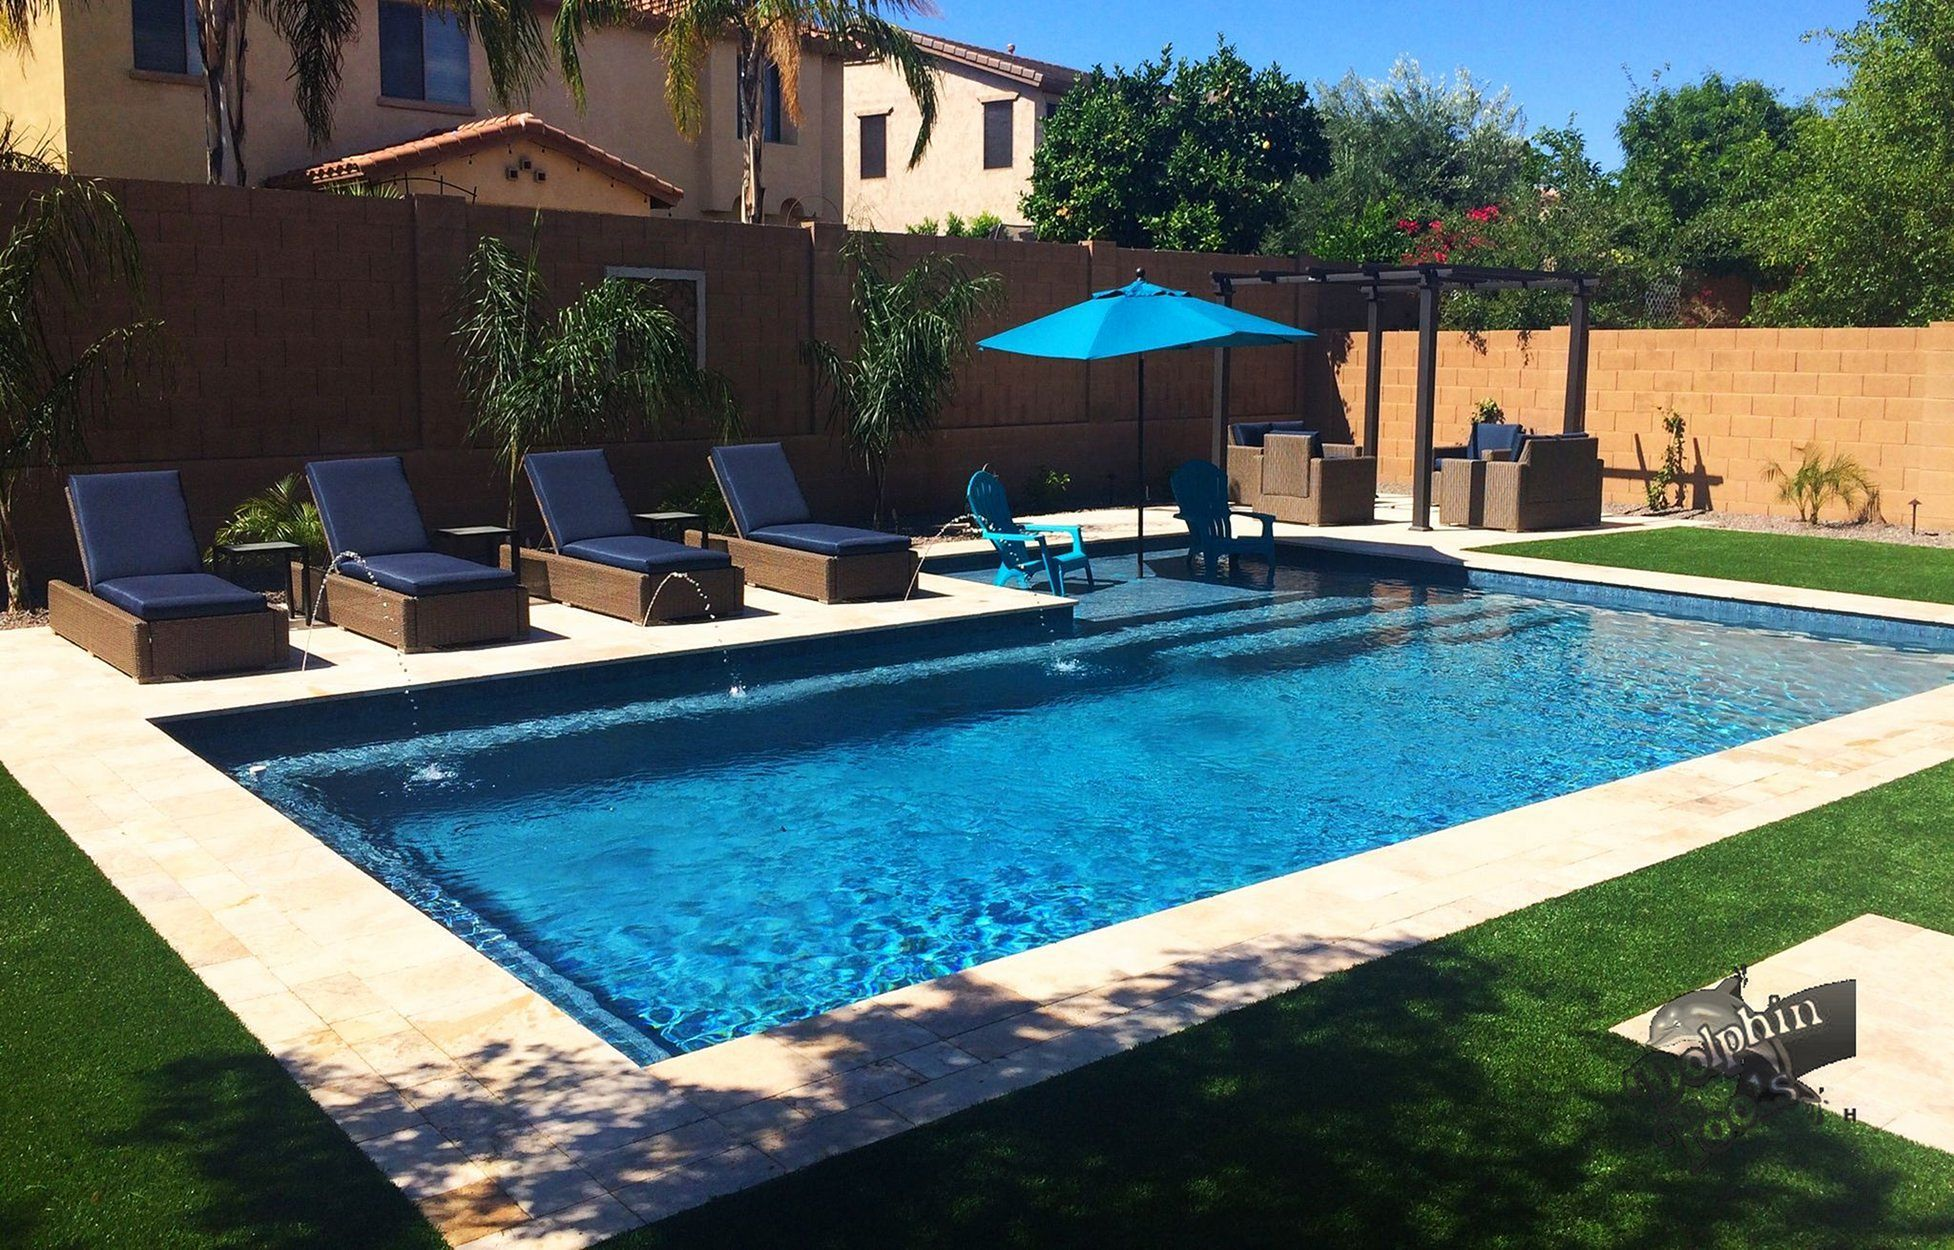 25 Stunning Rectangle Inground Pool Design Ideas With Sun Shelf In 2020 Inground Pool Designs Backyard Pool Landscaping Small Swimming Pools